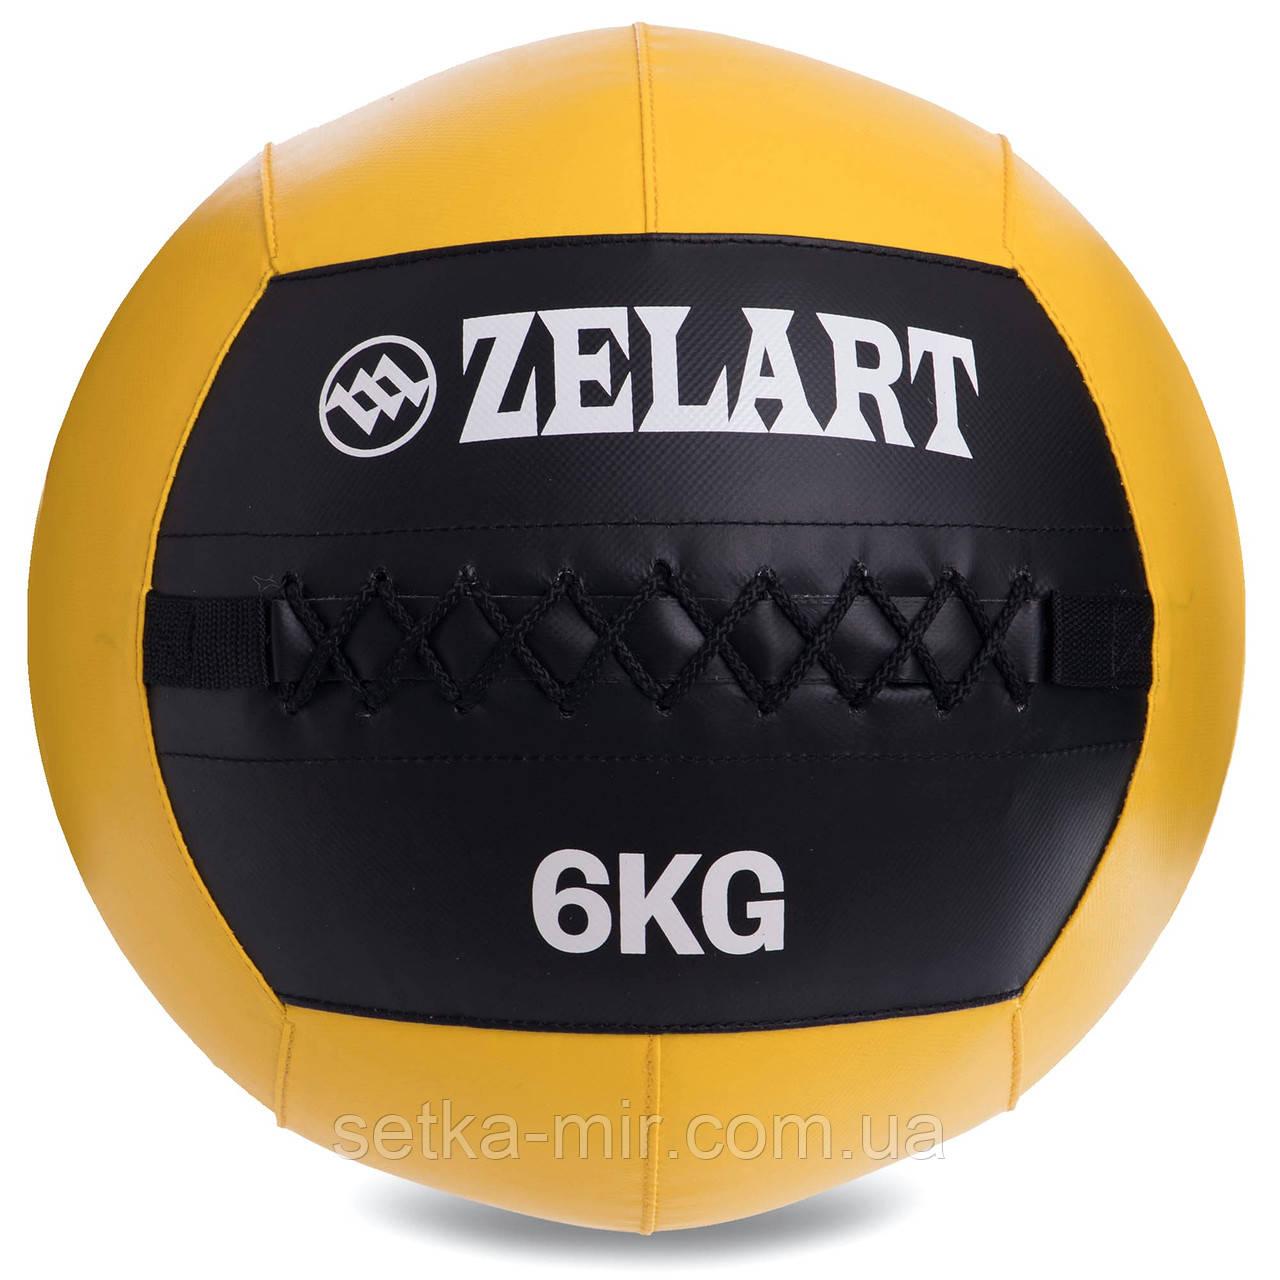 Мяч волбол для кроссфита и фитнеса 6кг Zelart WALL BALL FI-5168-6